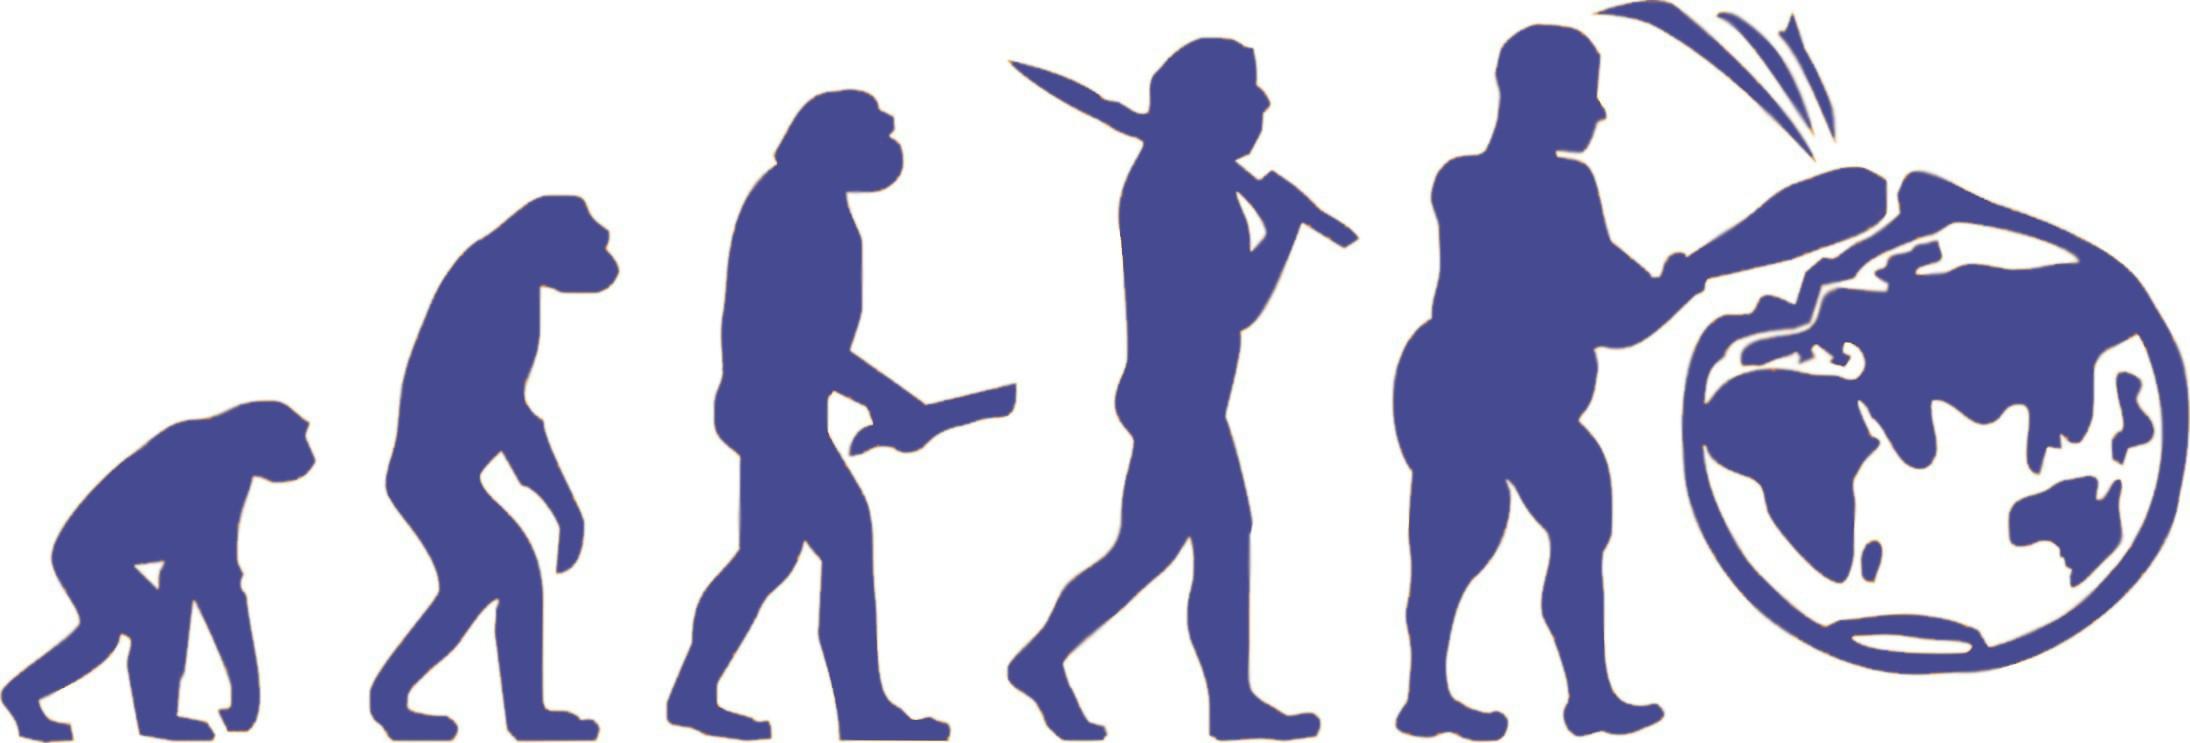 evolution-2305142